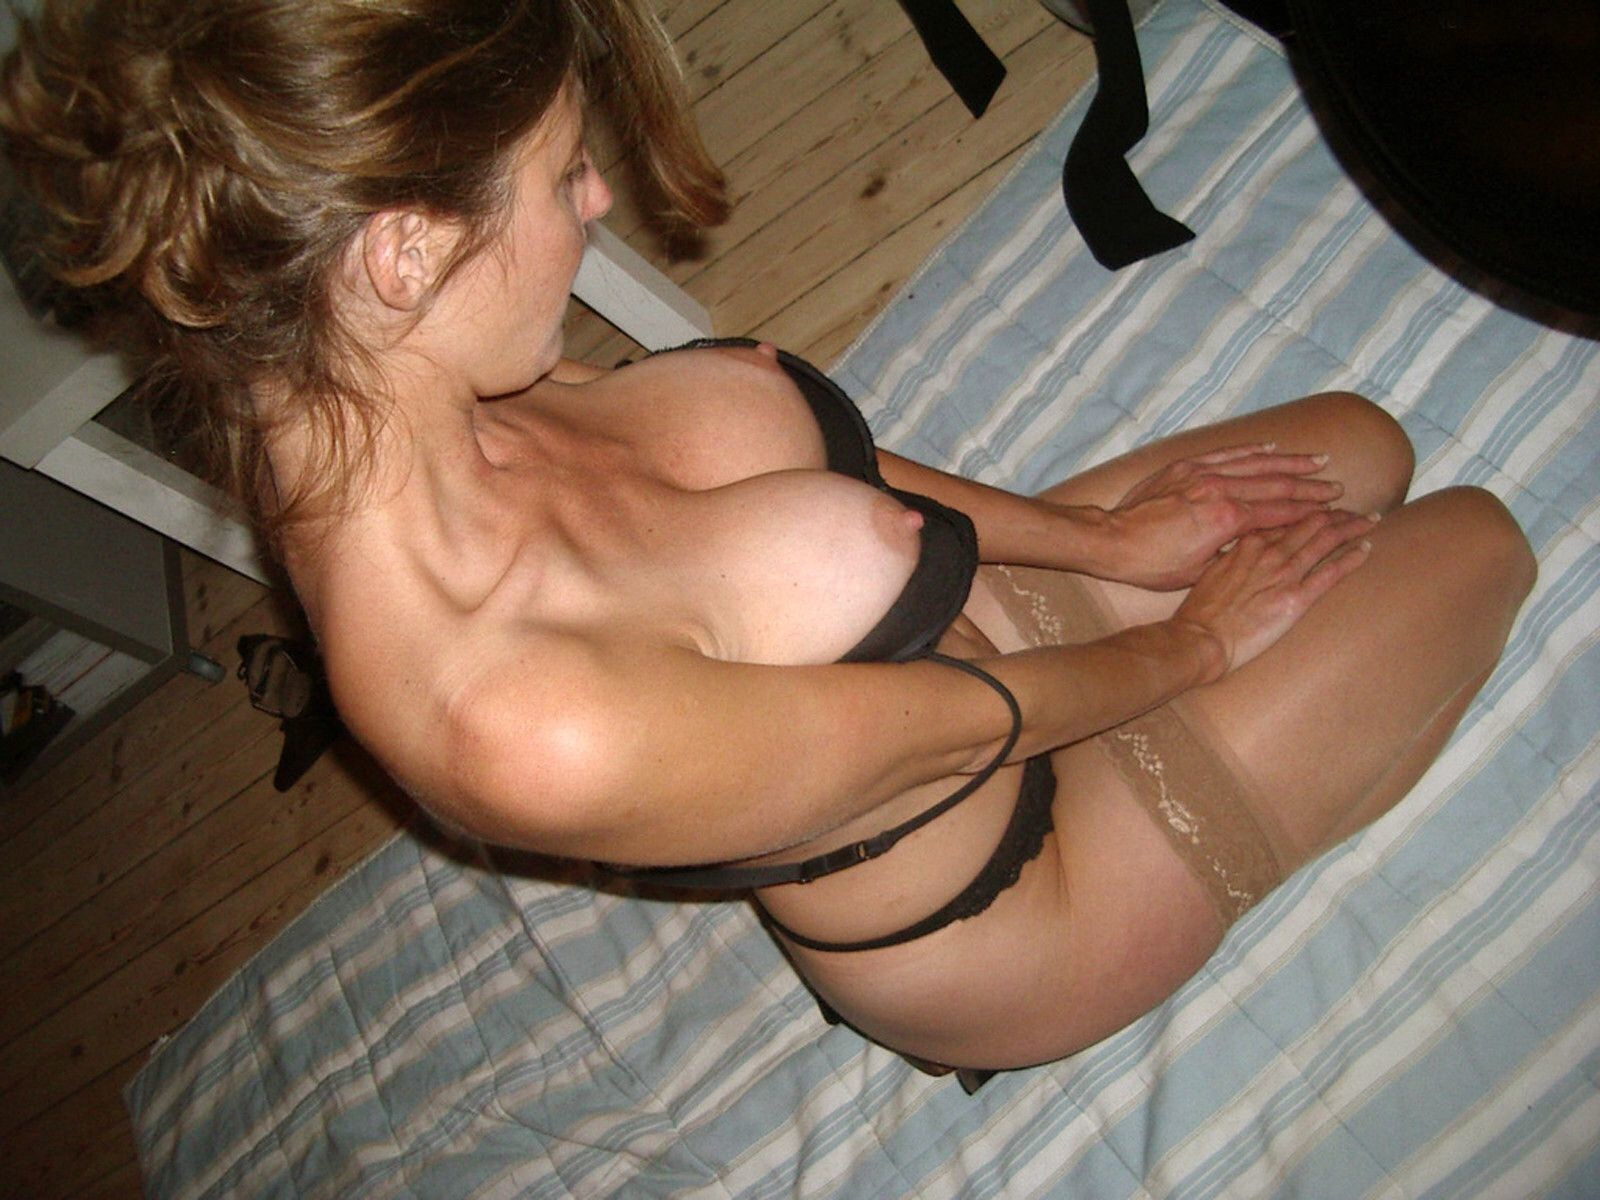 ass blonde hair breasts erect nipples extro green eyess